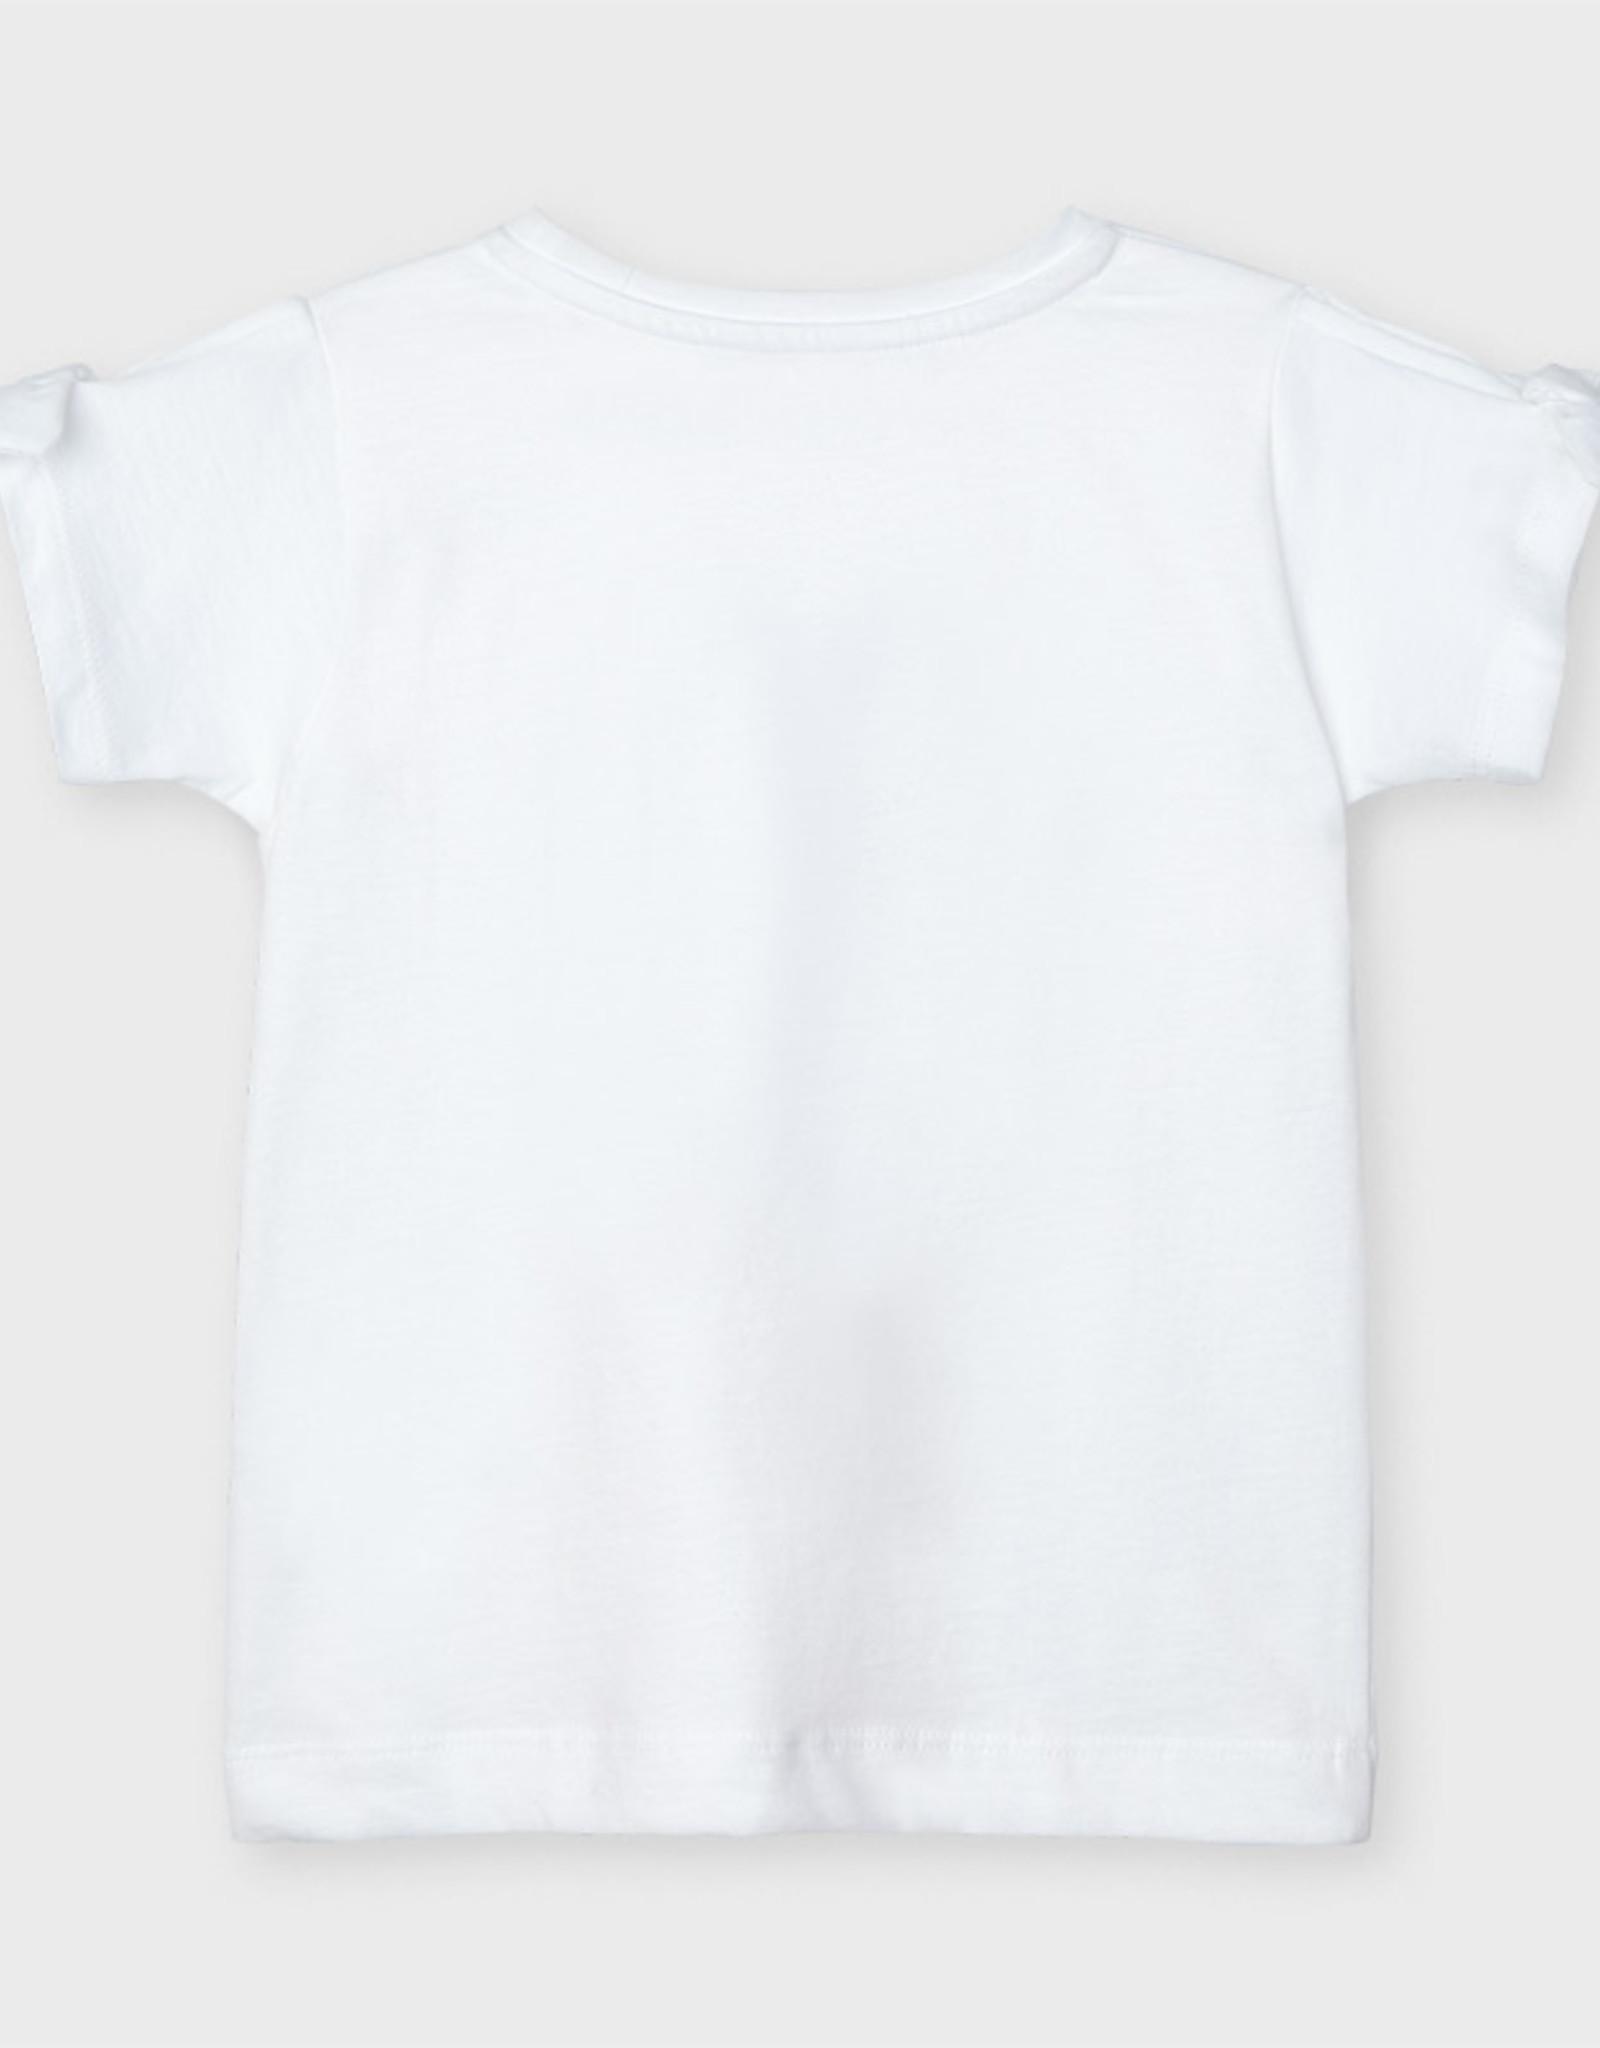 Mayoral Witte ecofriends t-shirt